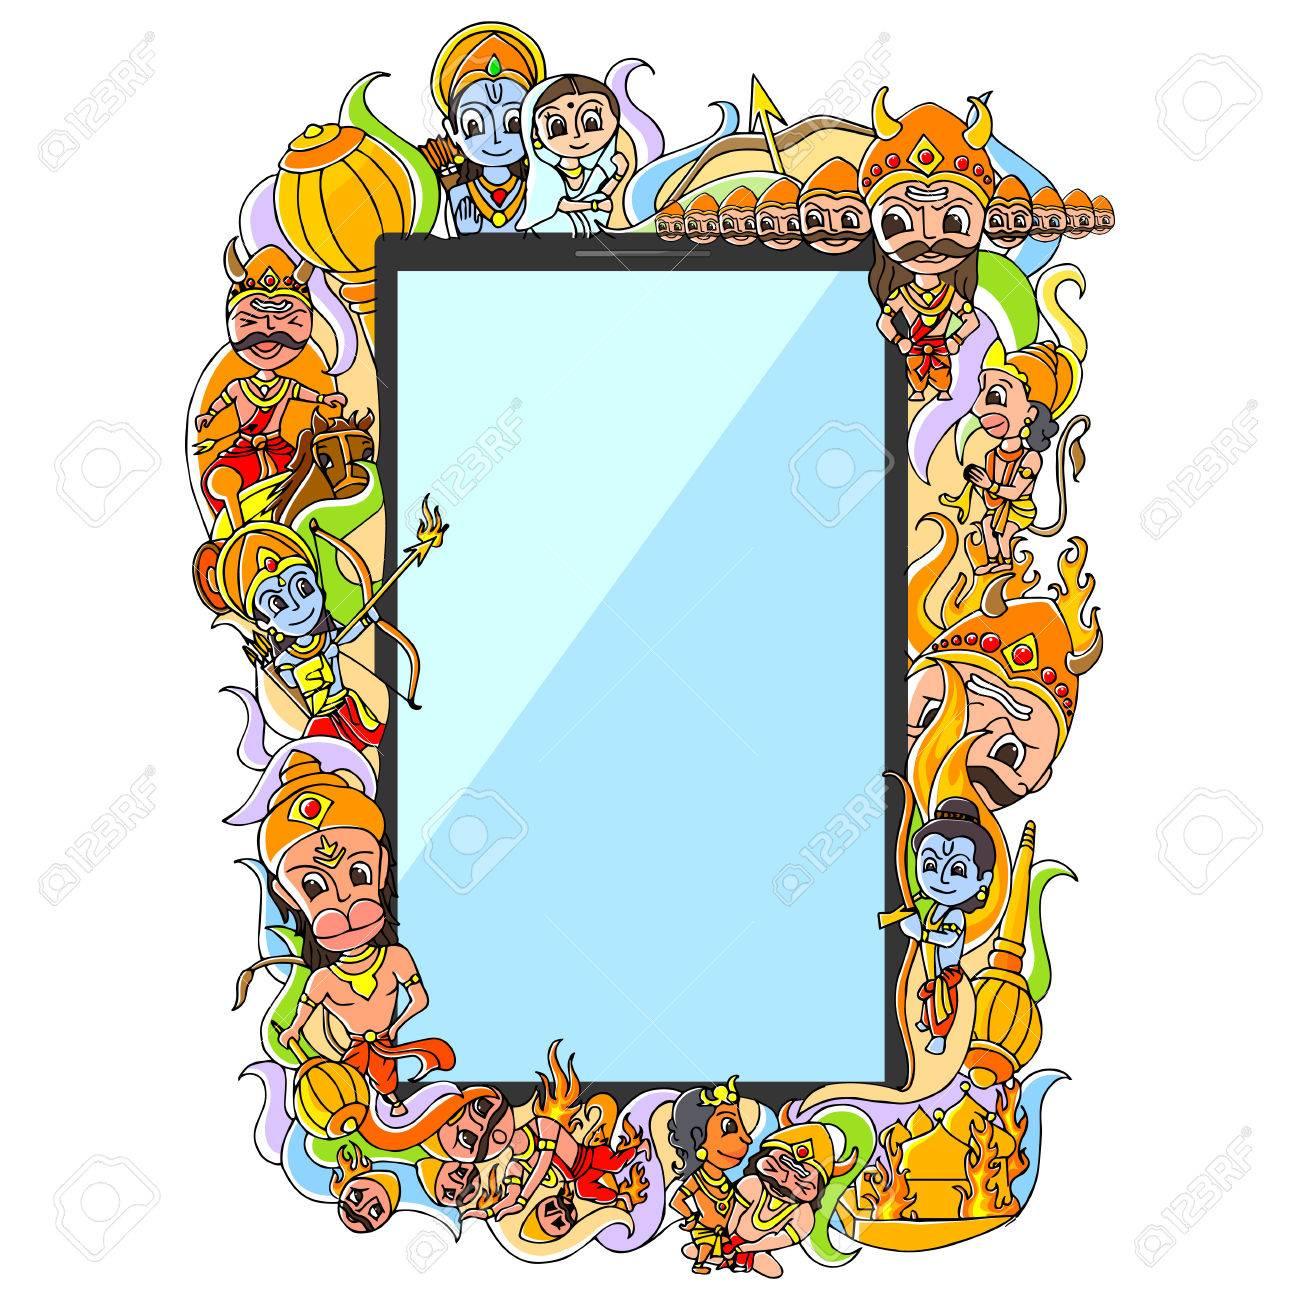 vector illustration of Happy Dussehra doodle drawing for mobile application - 45336693